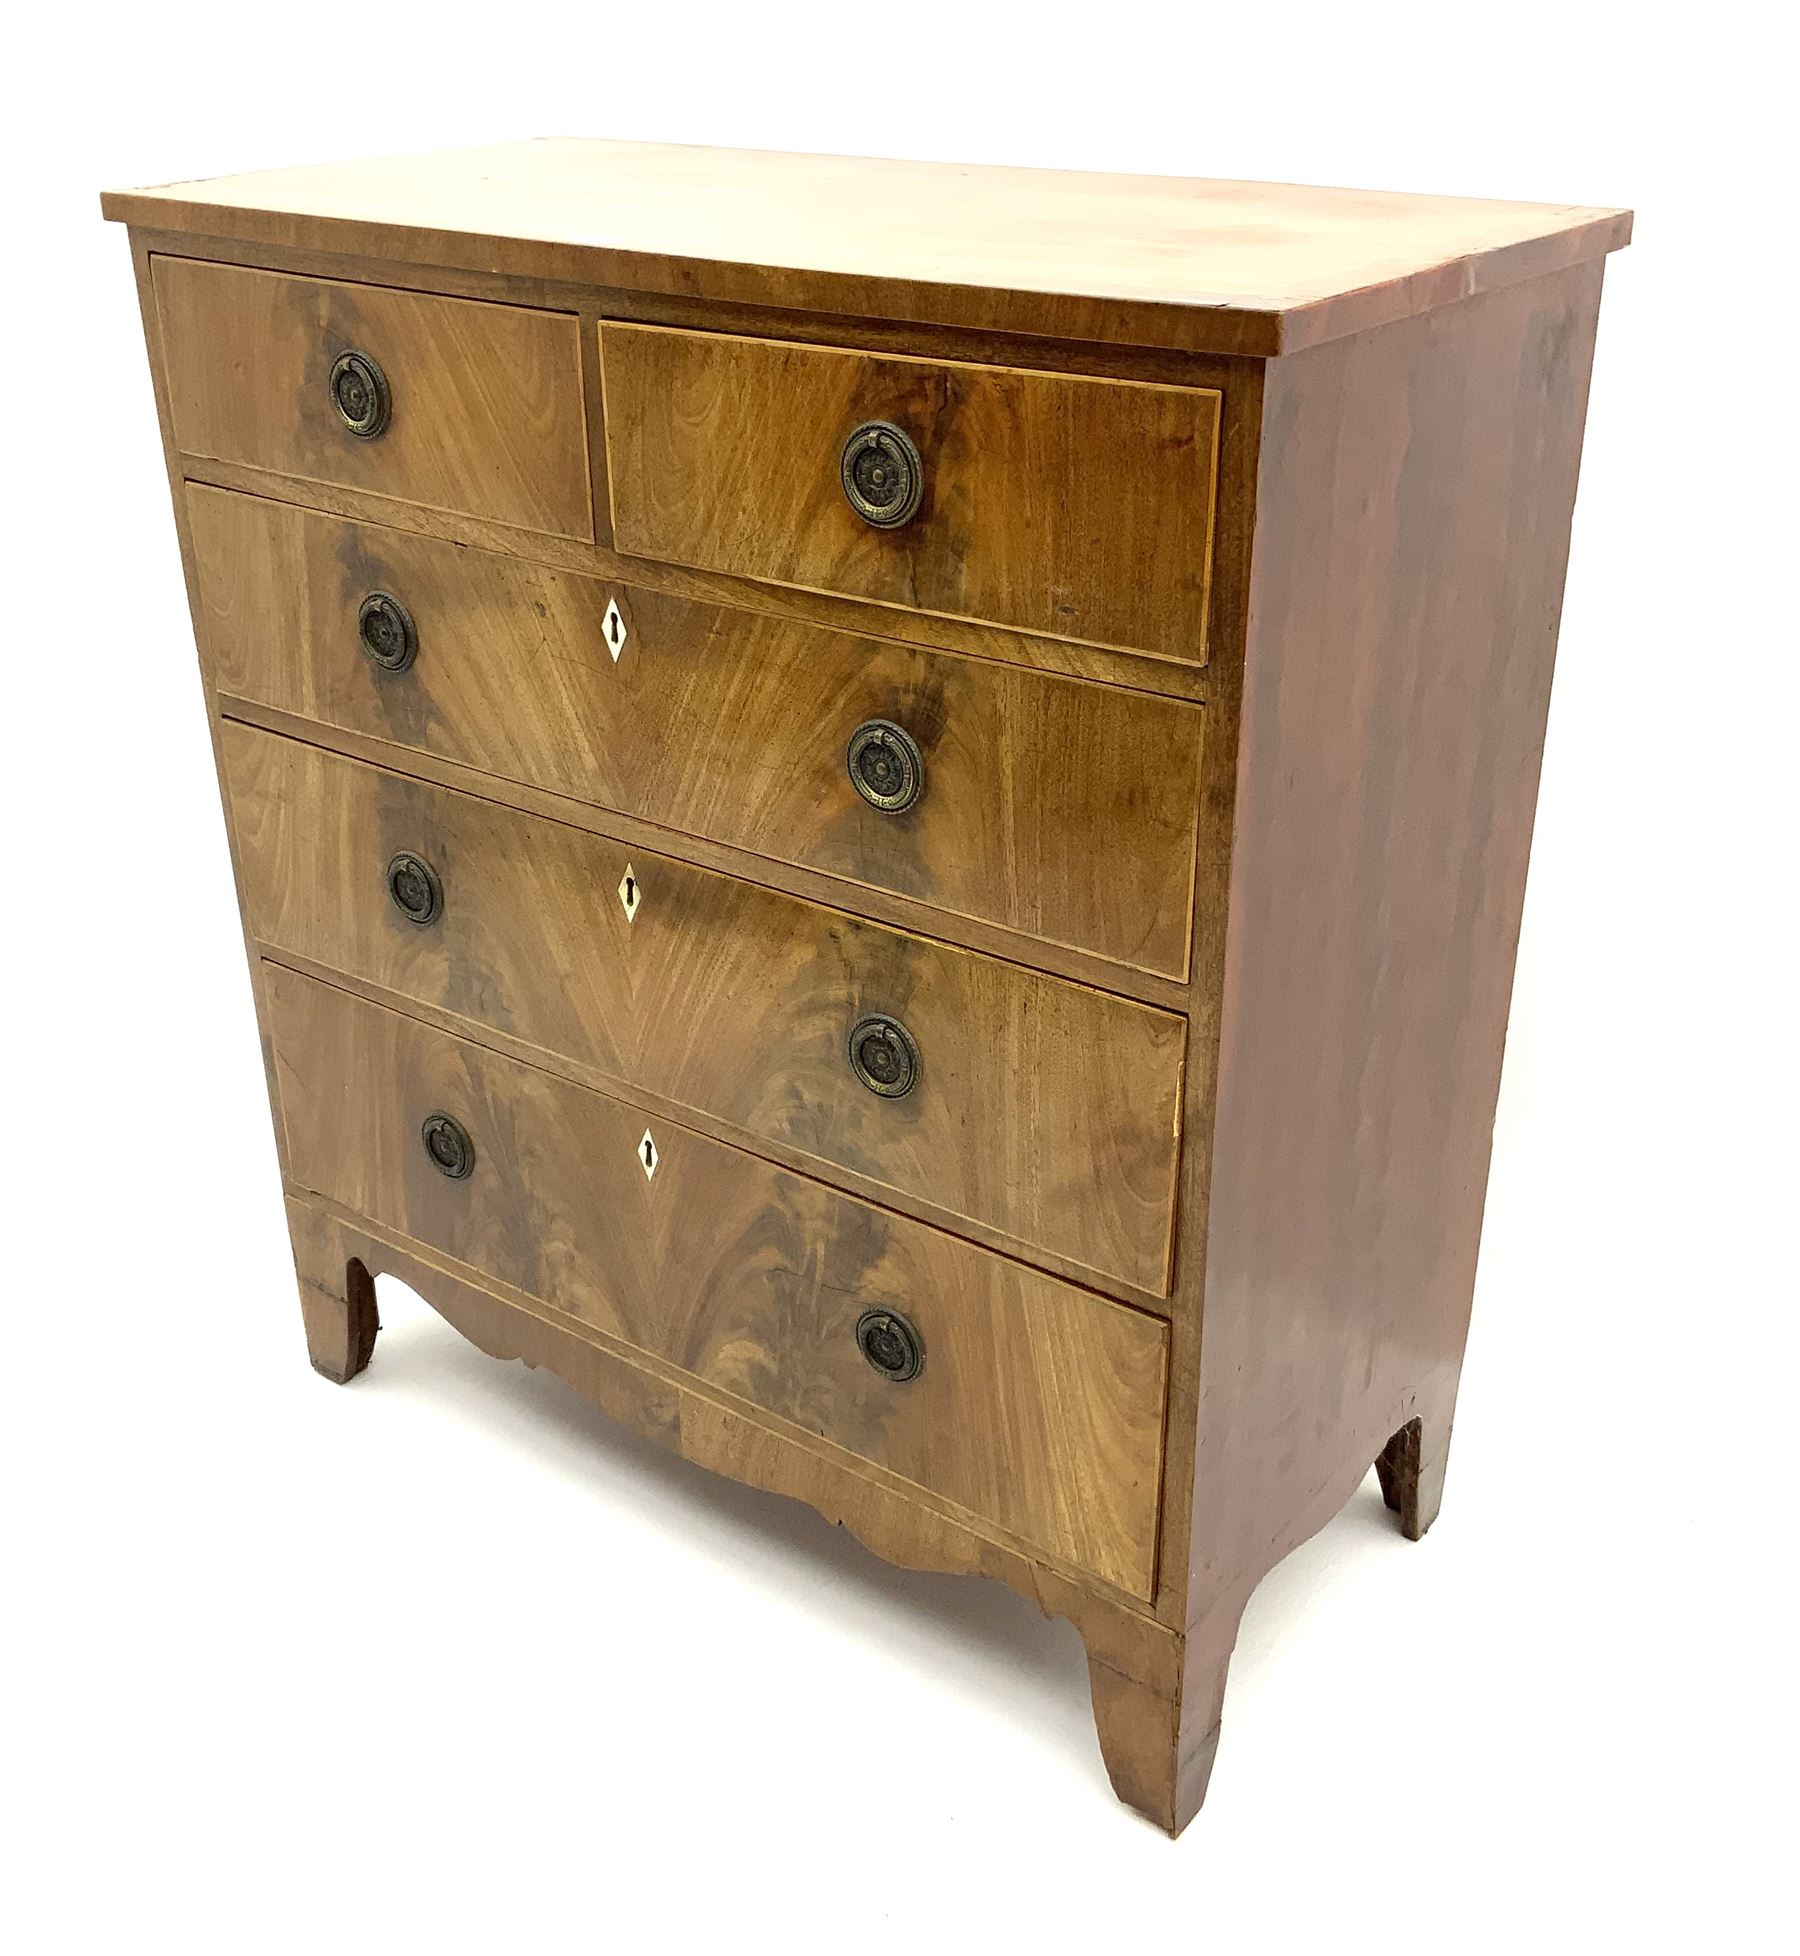 George III inlaid mahogany chest - Image 2 of 3